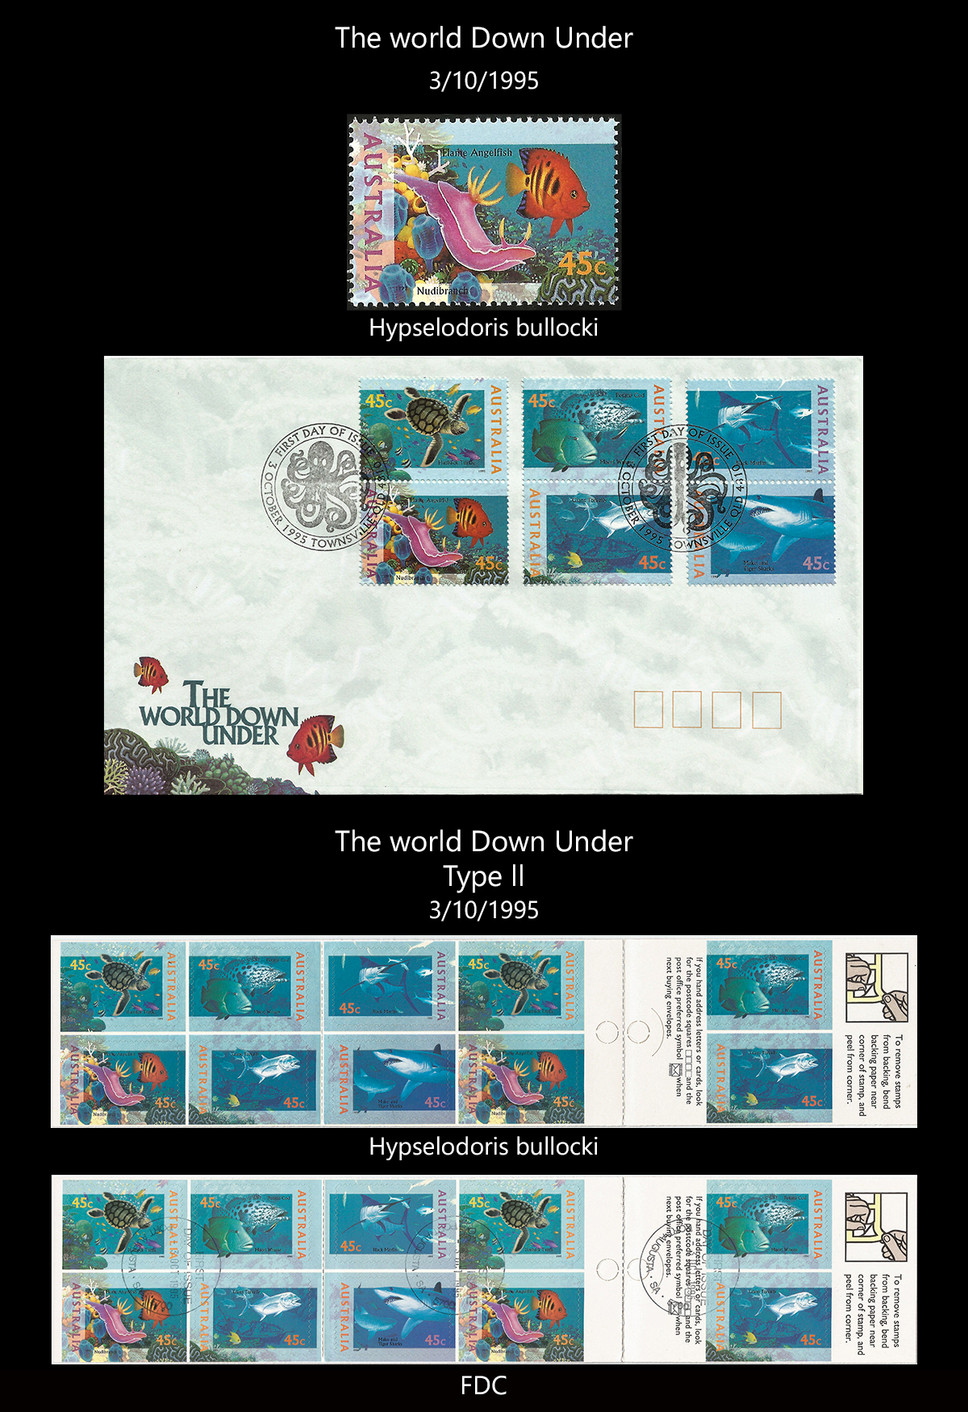 AUSTRALIA 2 Stamps & FDC